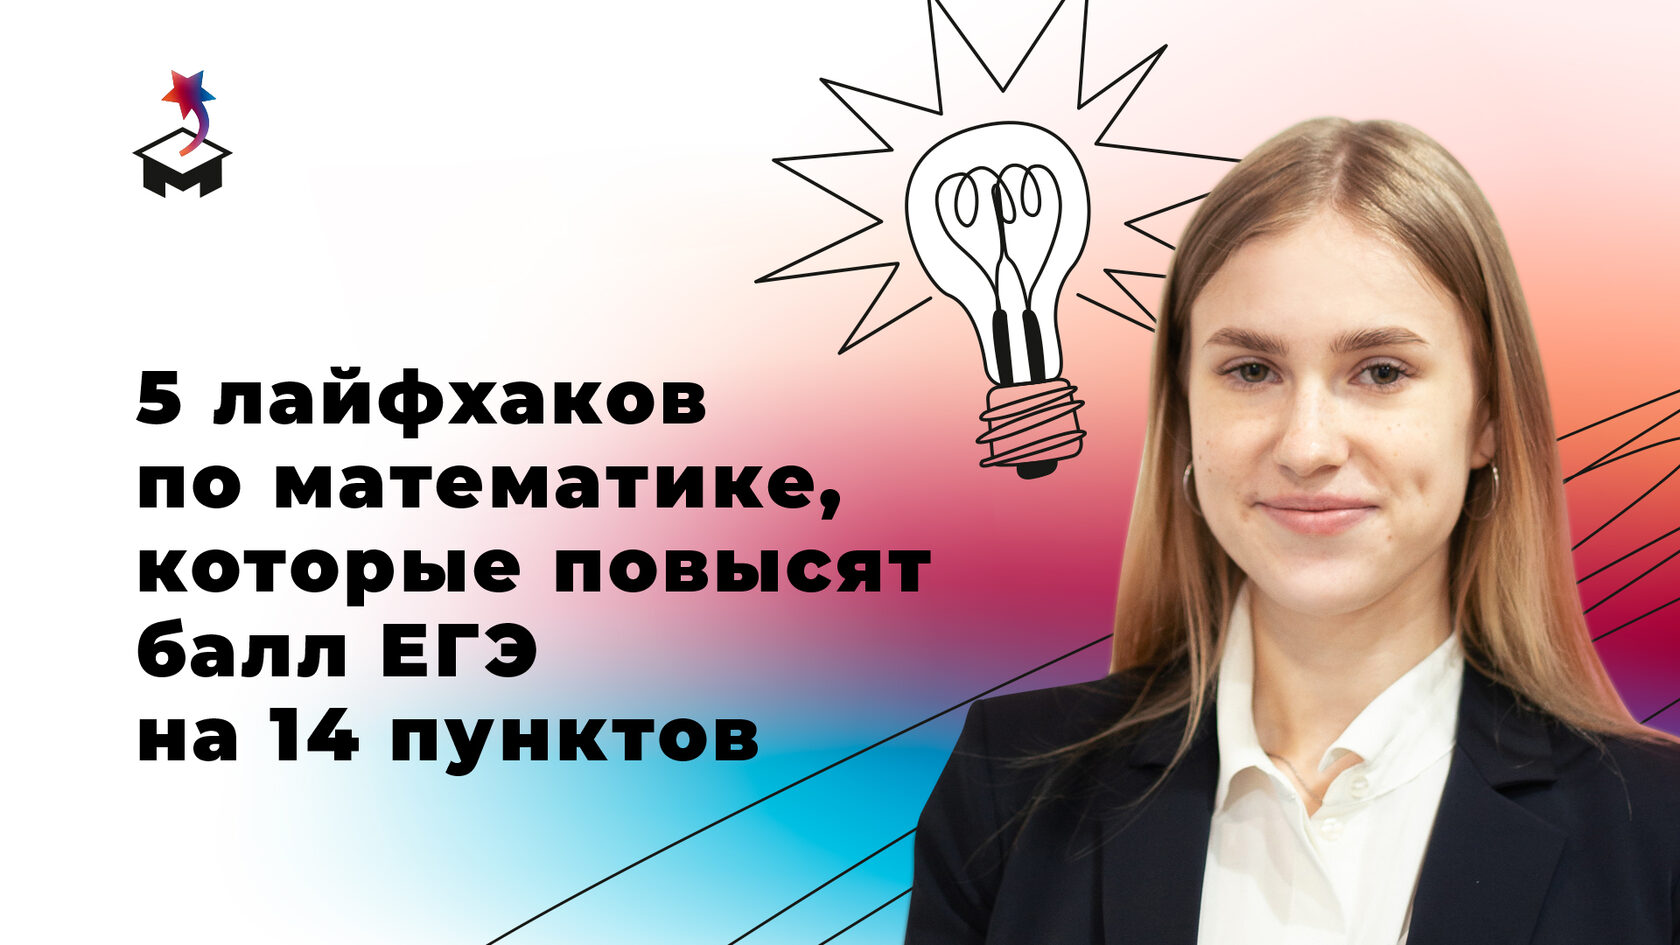 Преподаватель математики в Маркс Академии